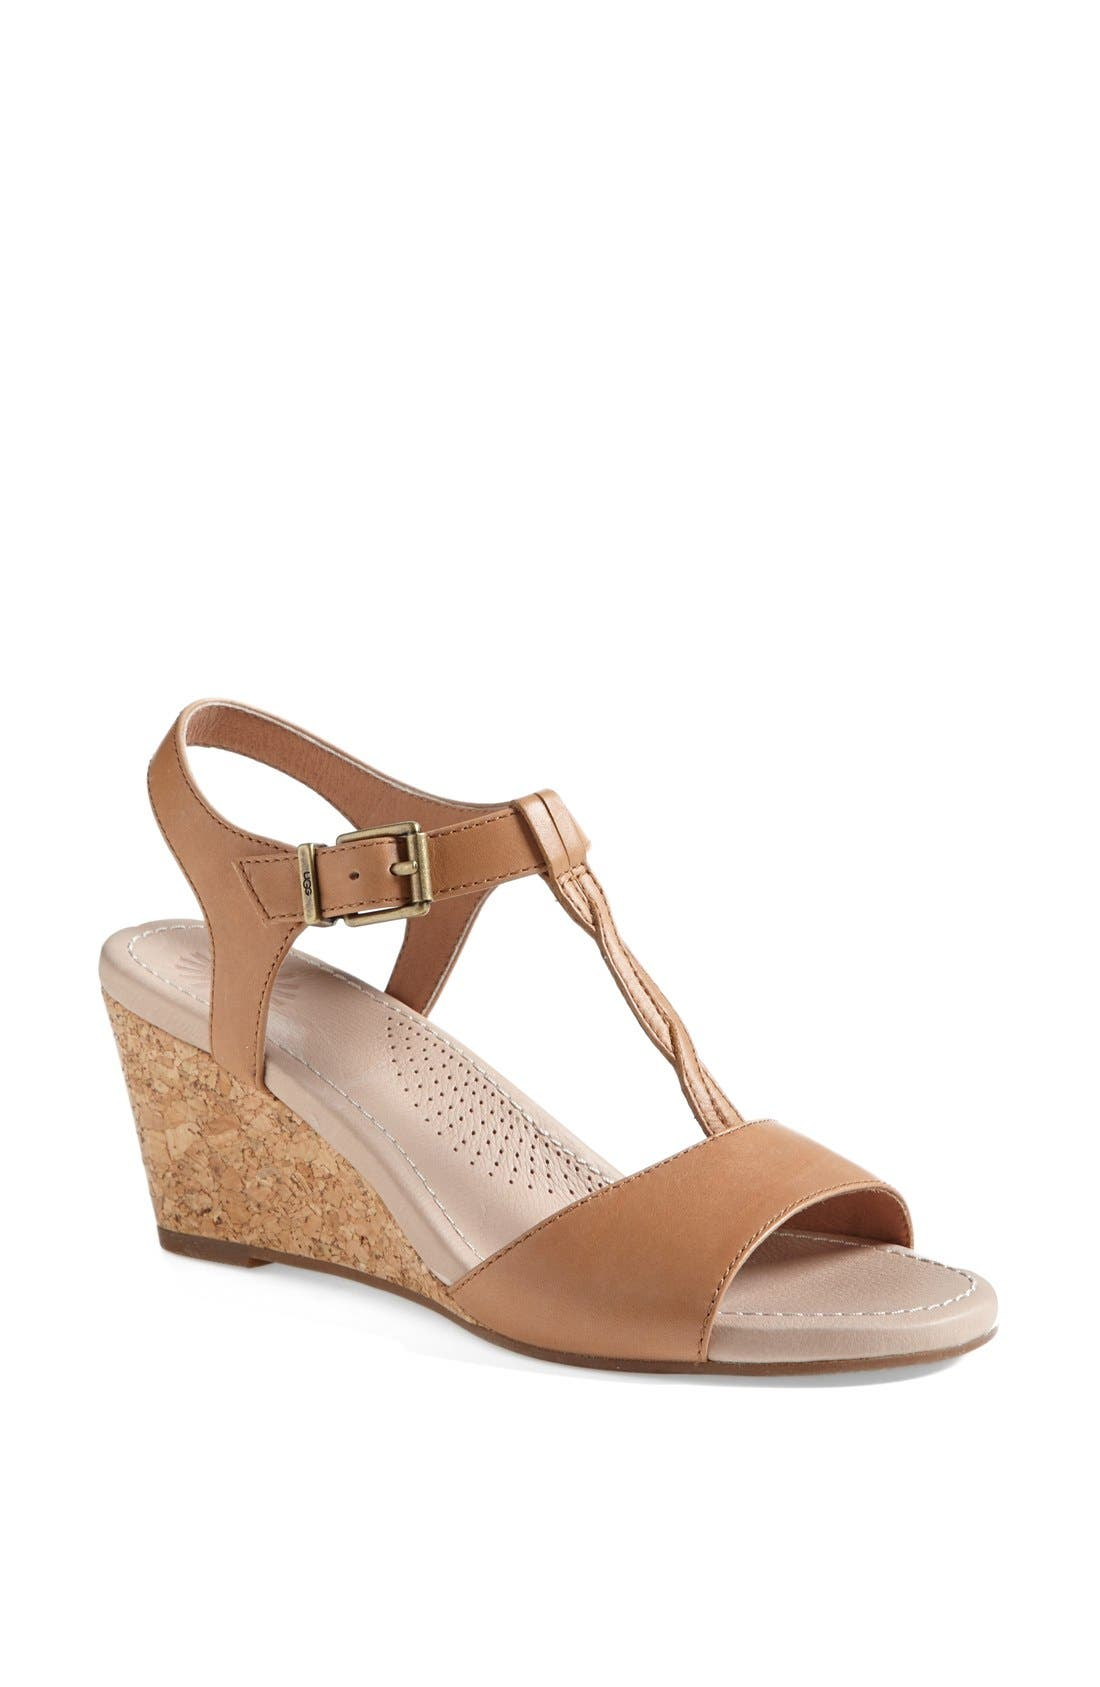 Alternate Image 1 Selected - UGG® Australia 'Arika' Sandal